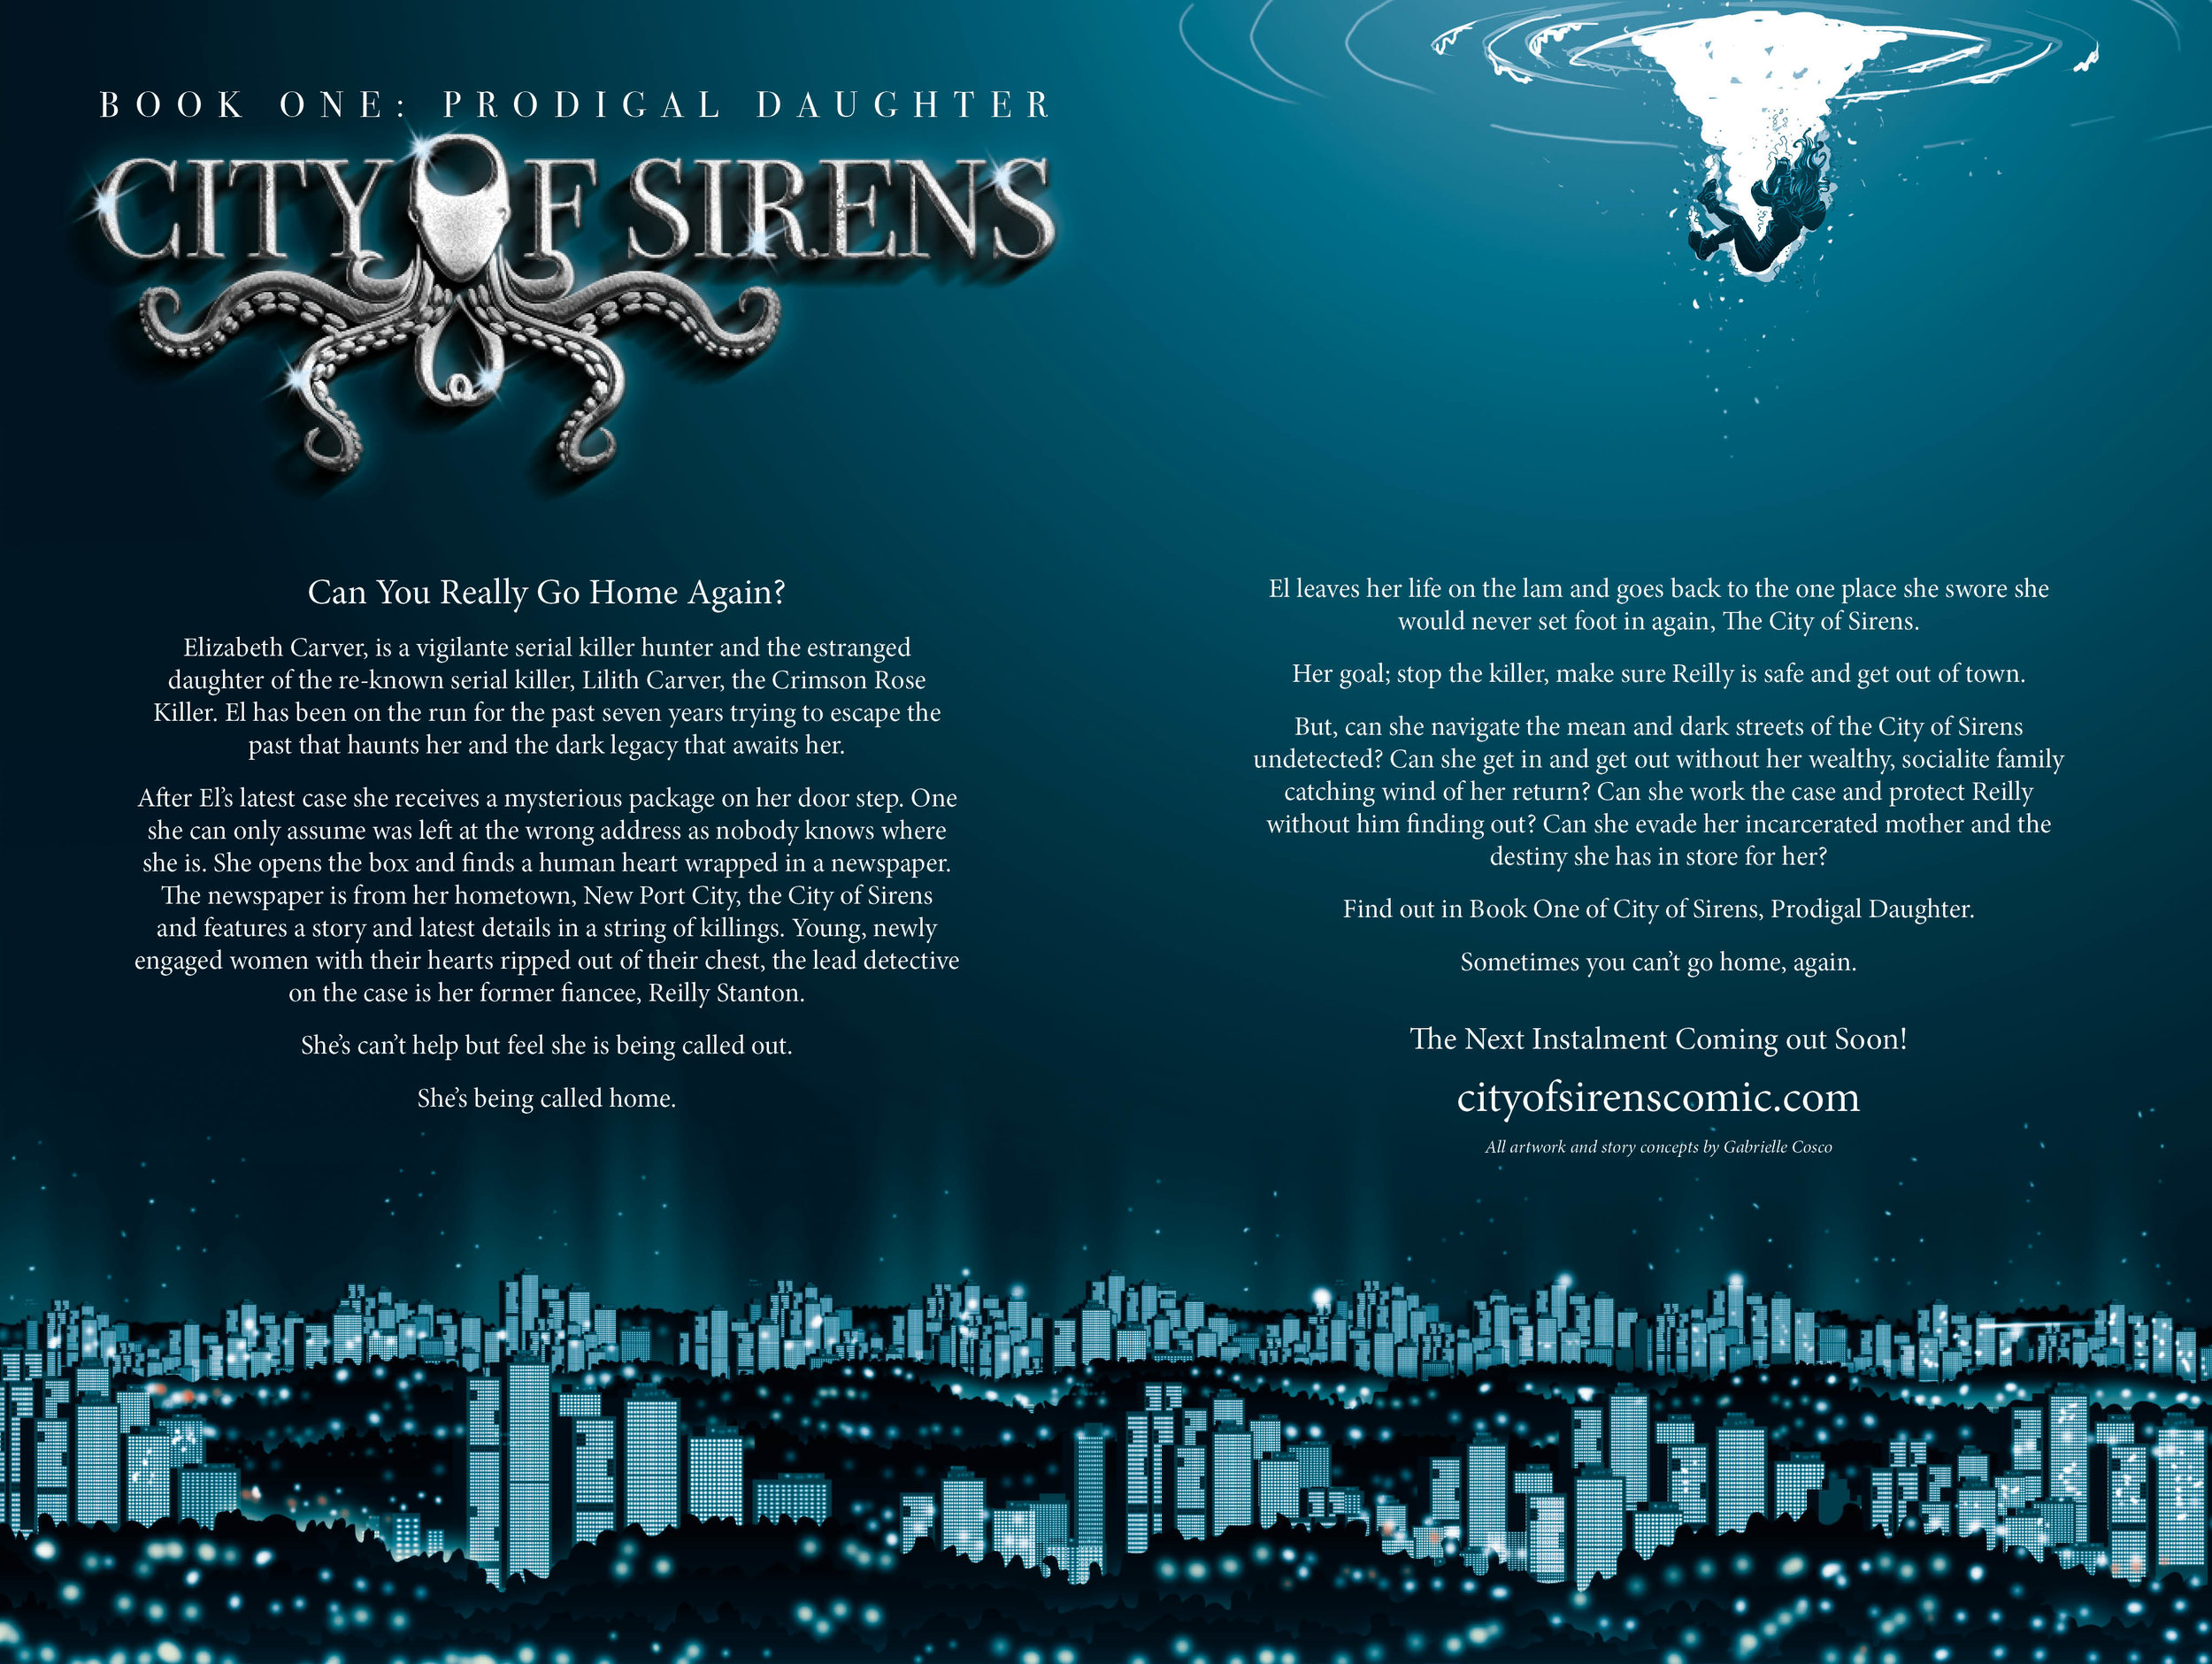 Siren-city-book-one-teaser11.jpg